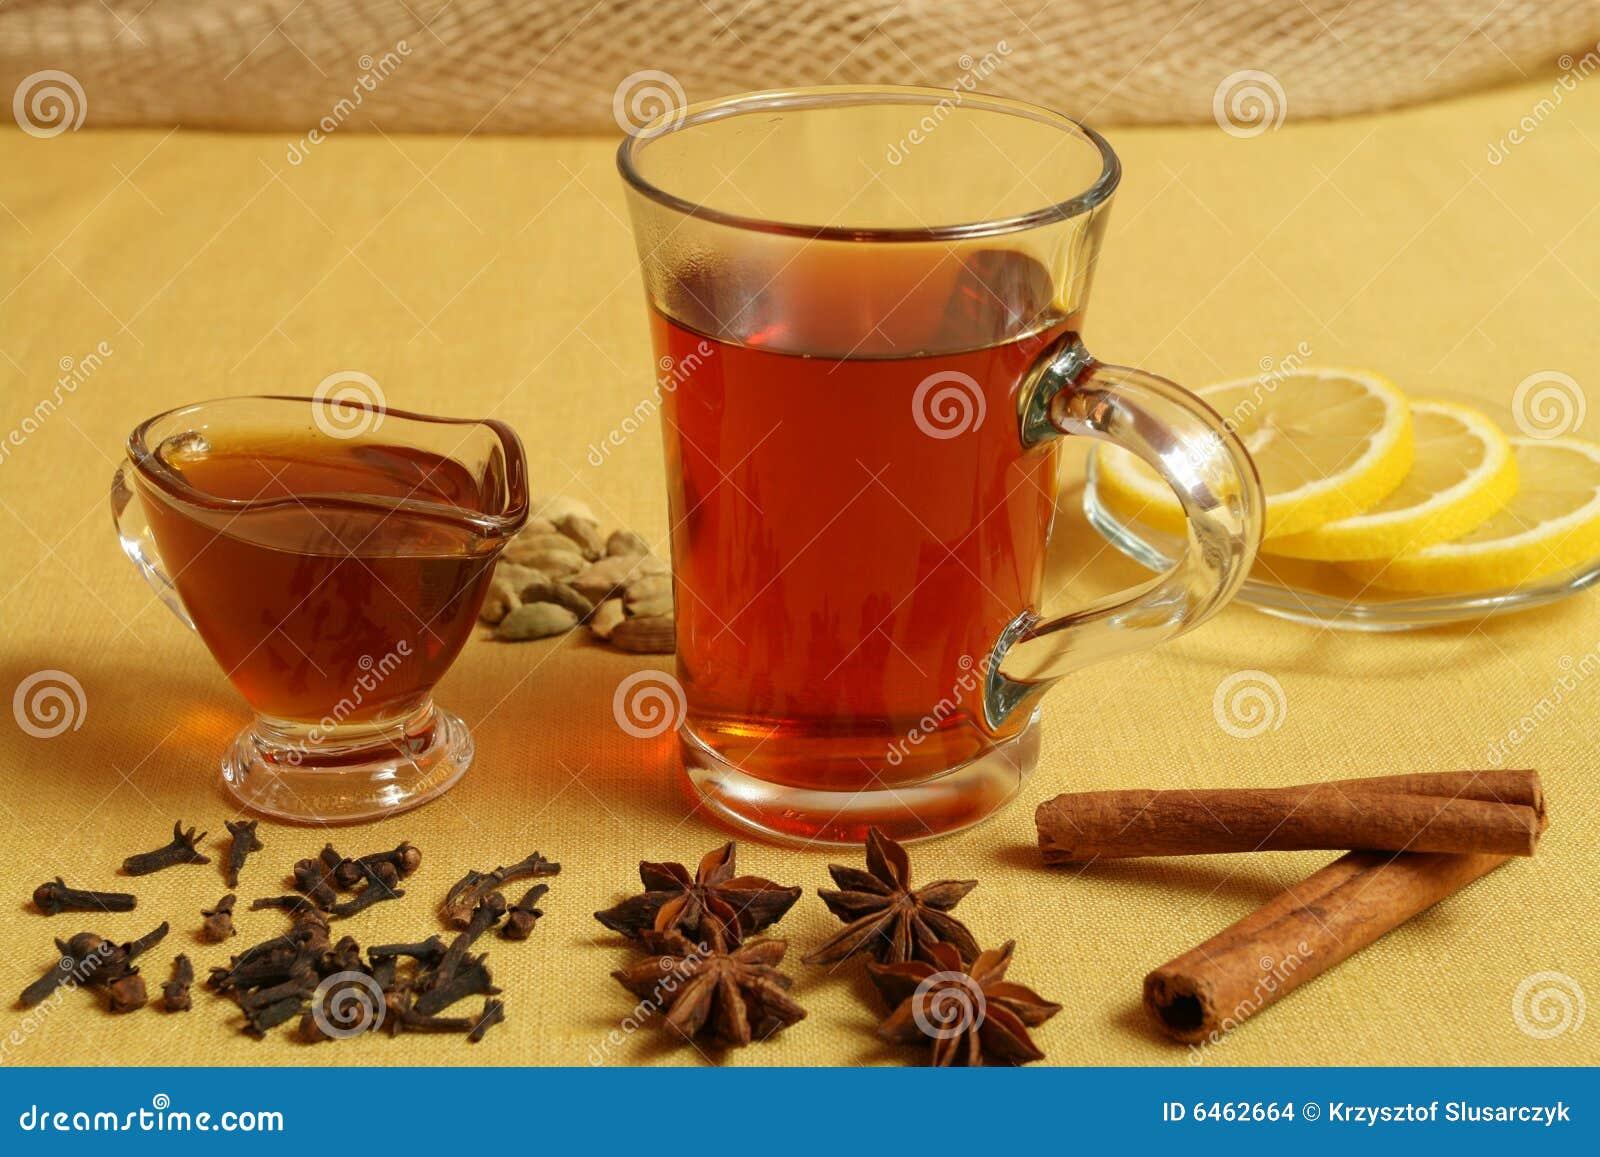 Cukierniana herbaty.